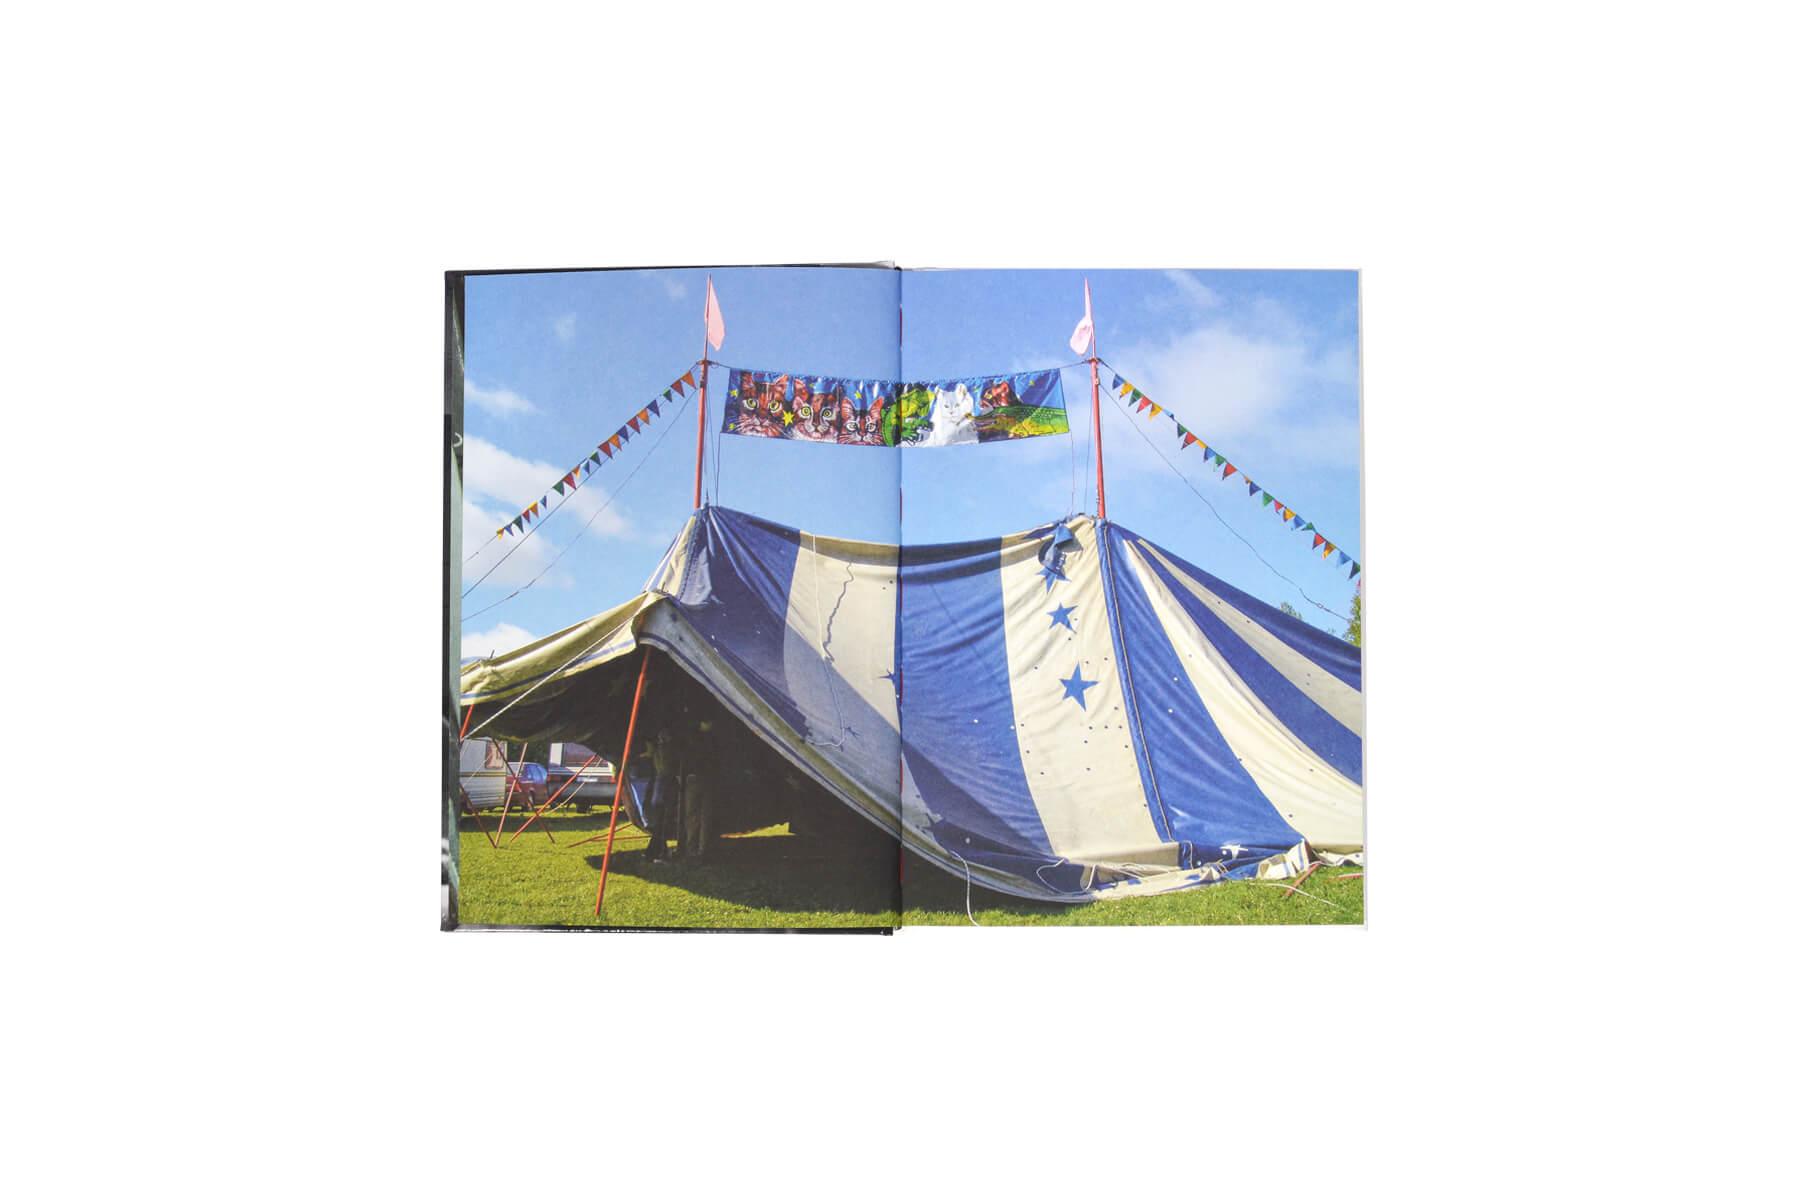 Product image of Rīgas cirks Riga Circus